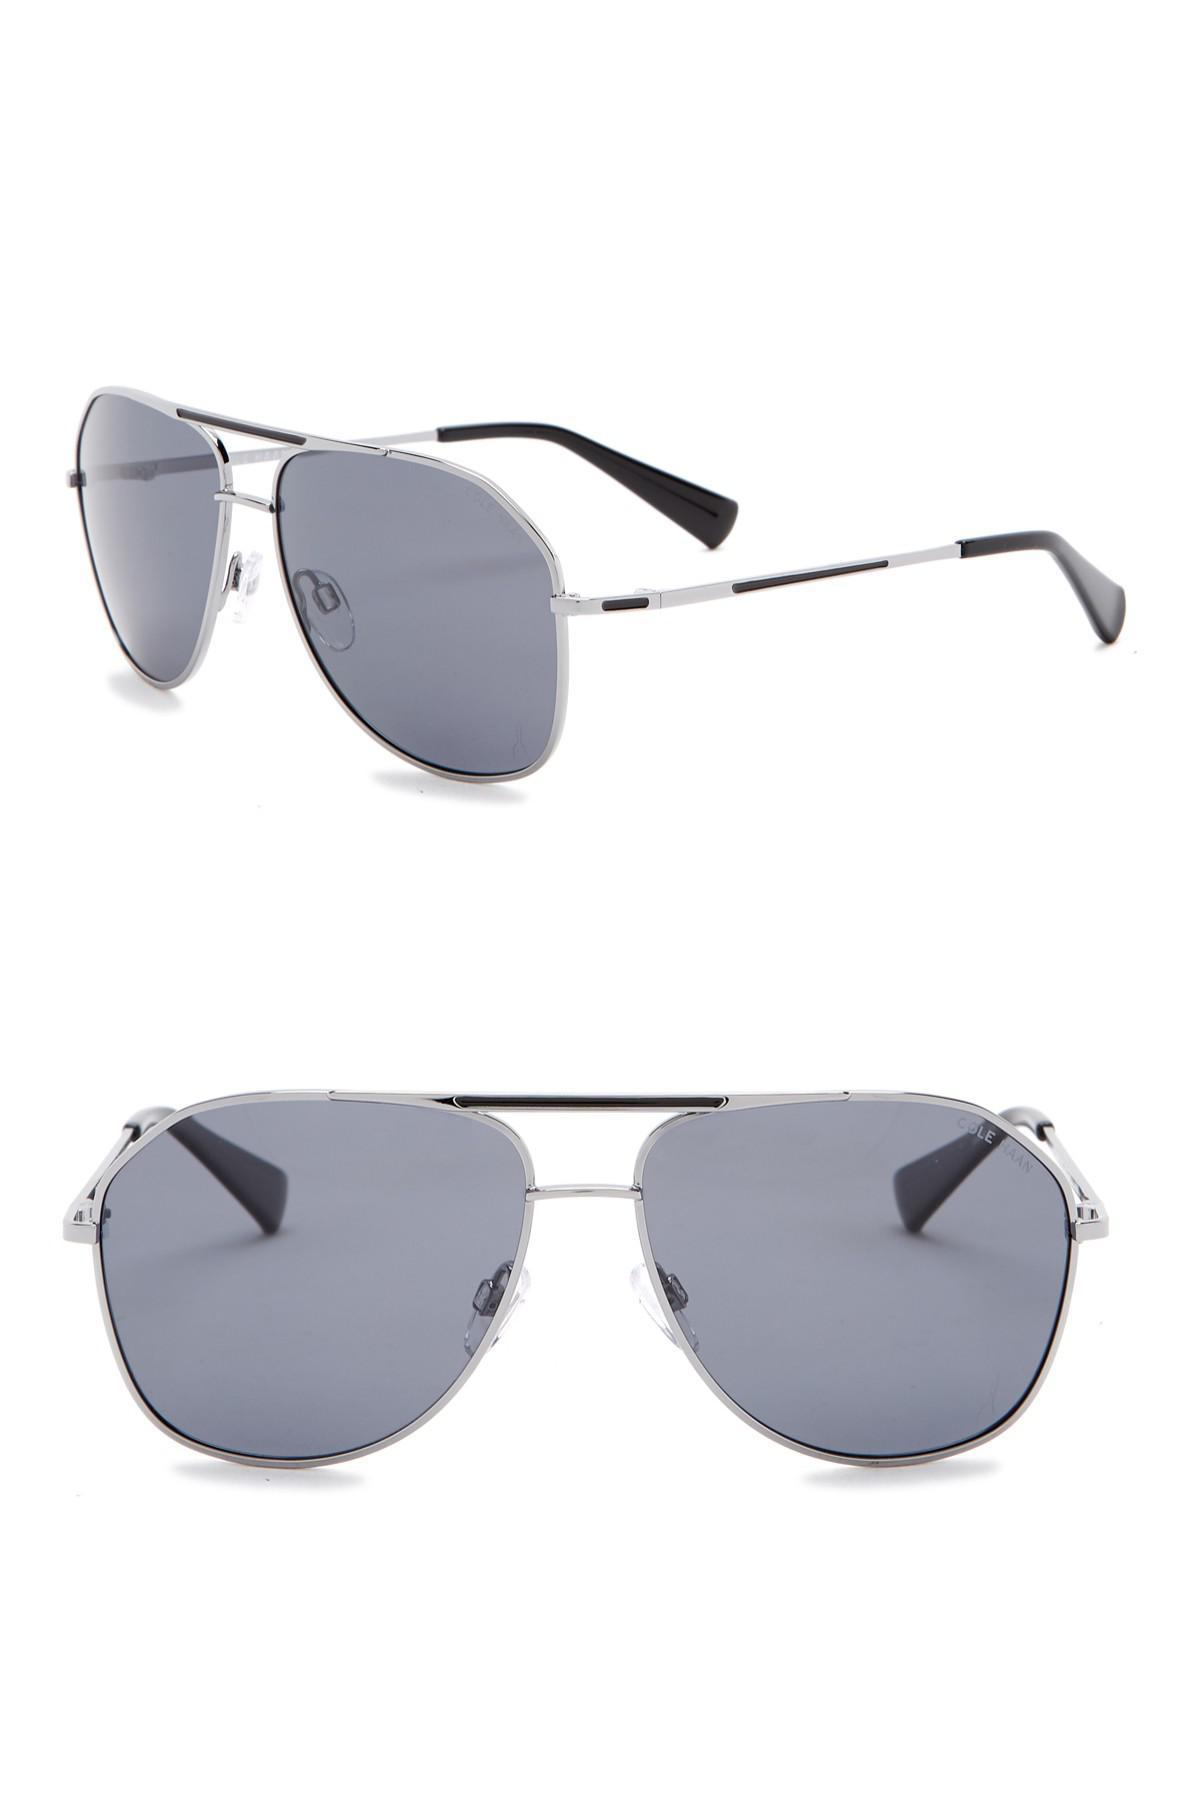 17251bc801c Lyst - Cole Haan 60mm Polarized Aviator Sunglasses in Black